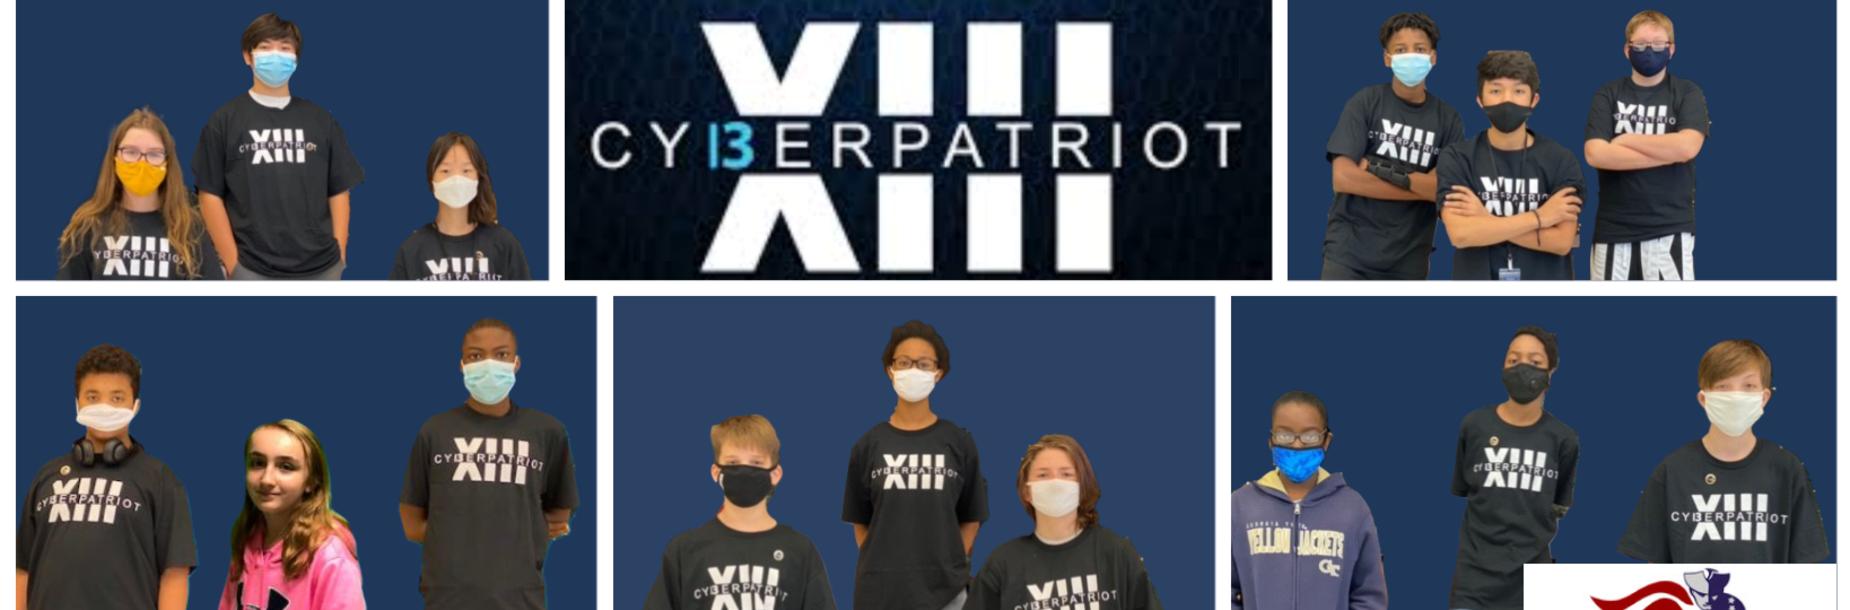 CYBERPatriots